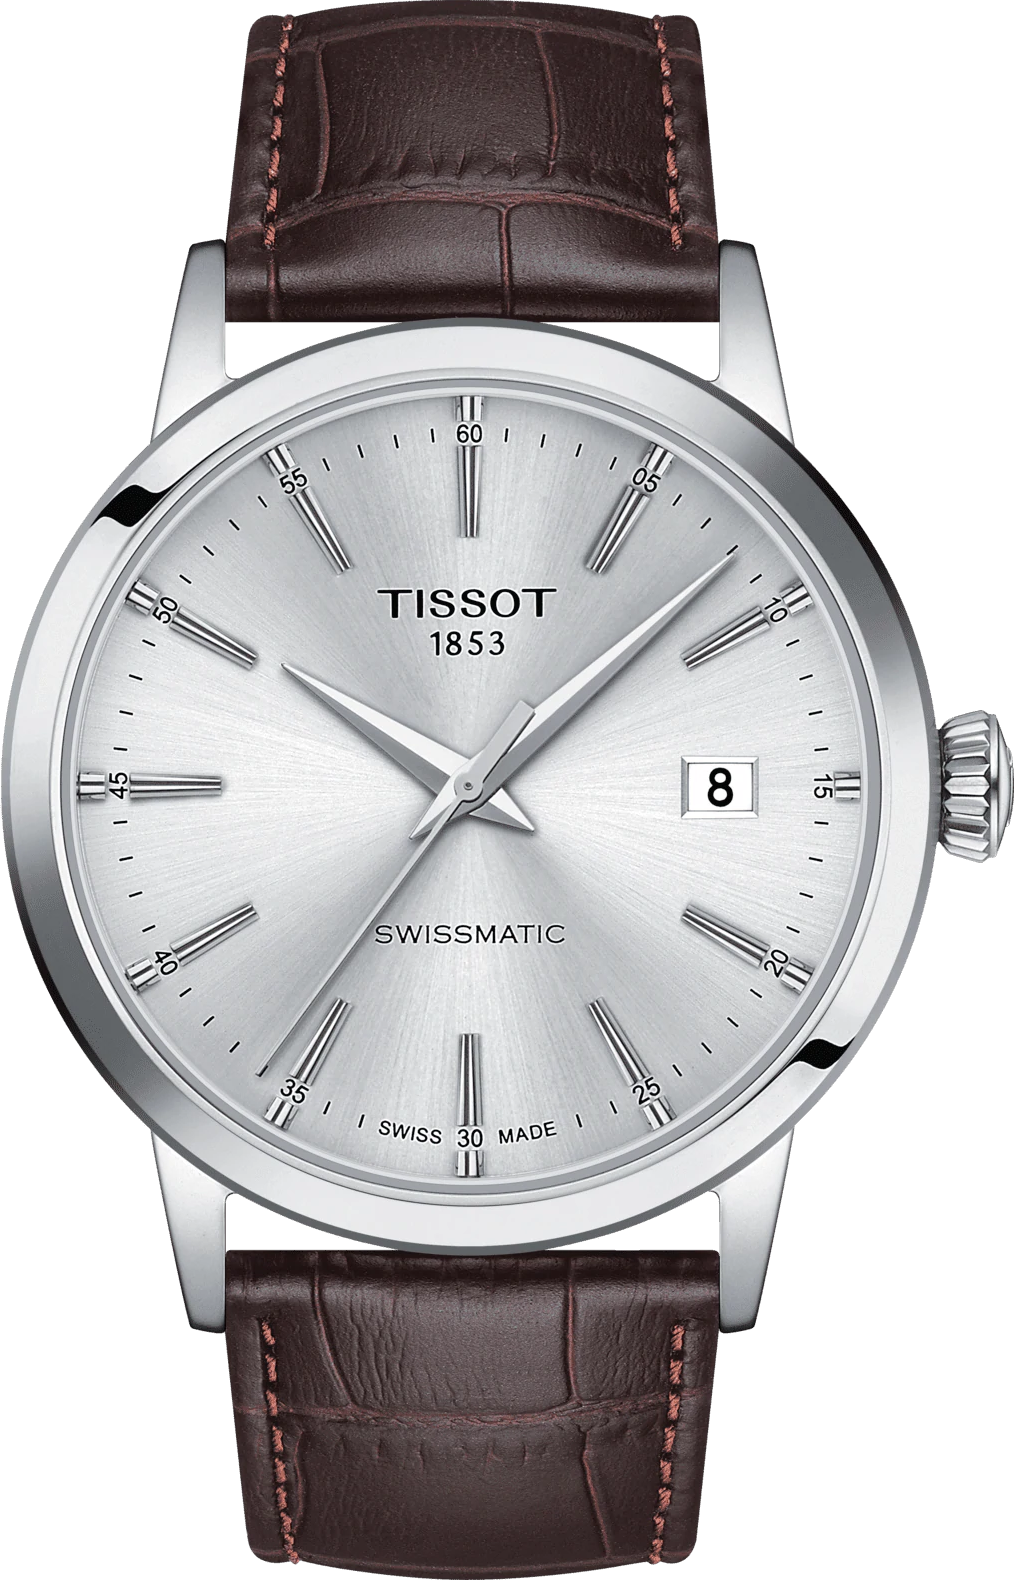 Tissot T129.407.16.031.00